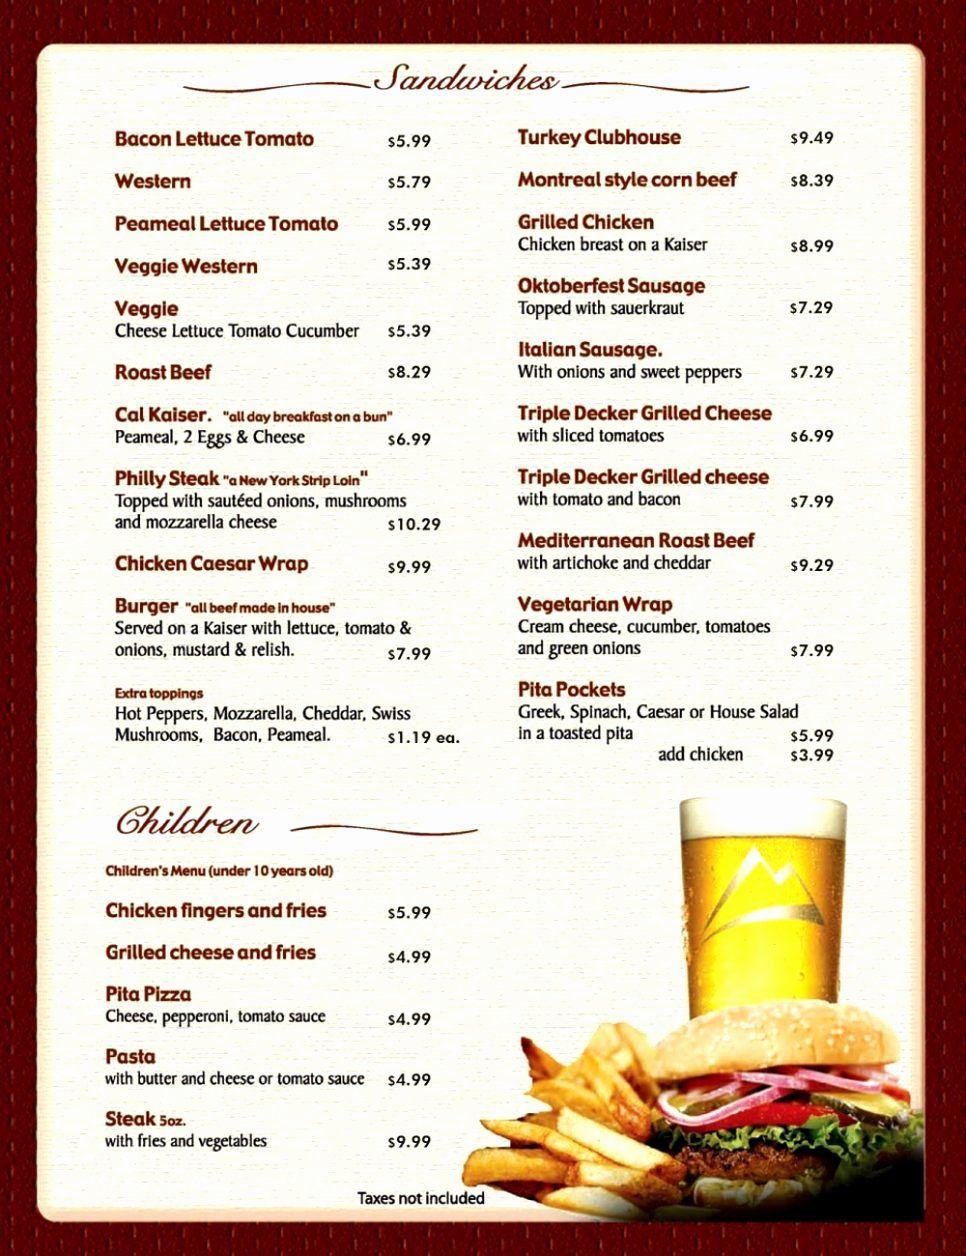 Restaurant Menu Template Microsoft Word New Free Printable Restaurant Menu Template Free Menu Templates Printable Menu Template Free Printable Menu Template Restaurant menu template microsoft word